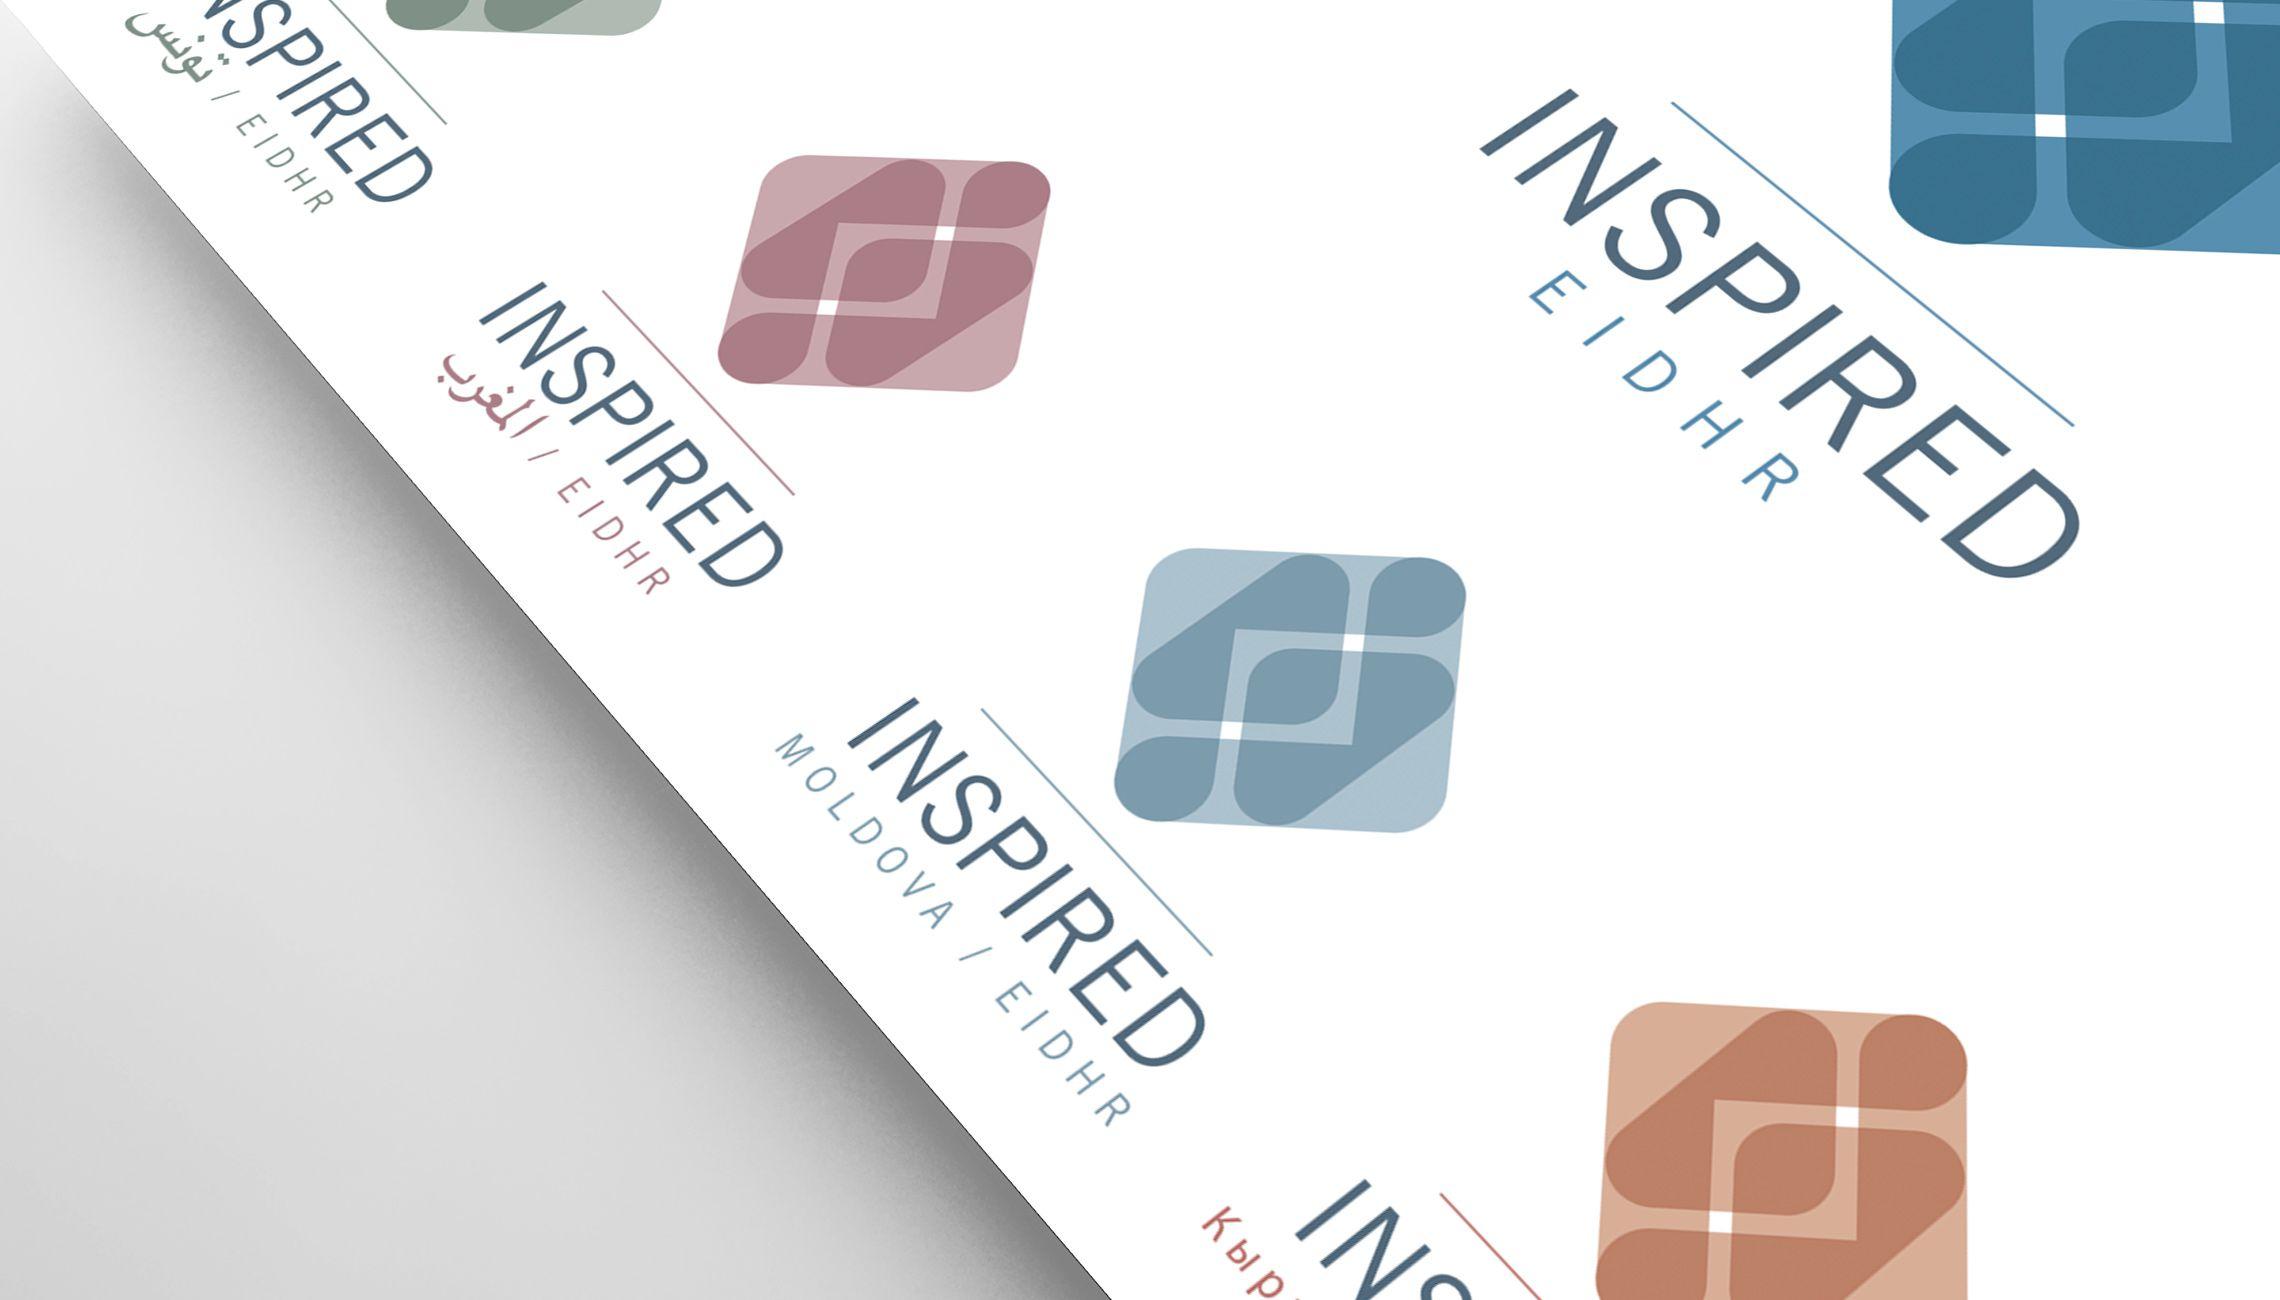 identity: INSPIRED identity design - image 1